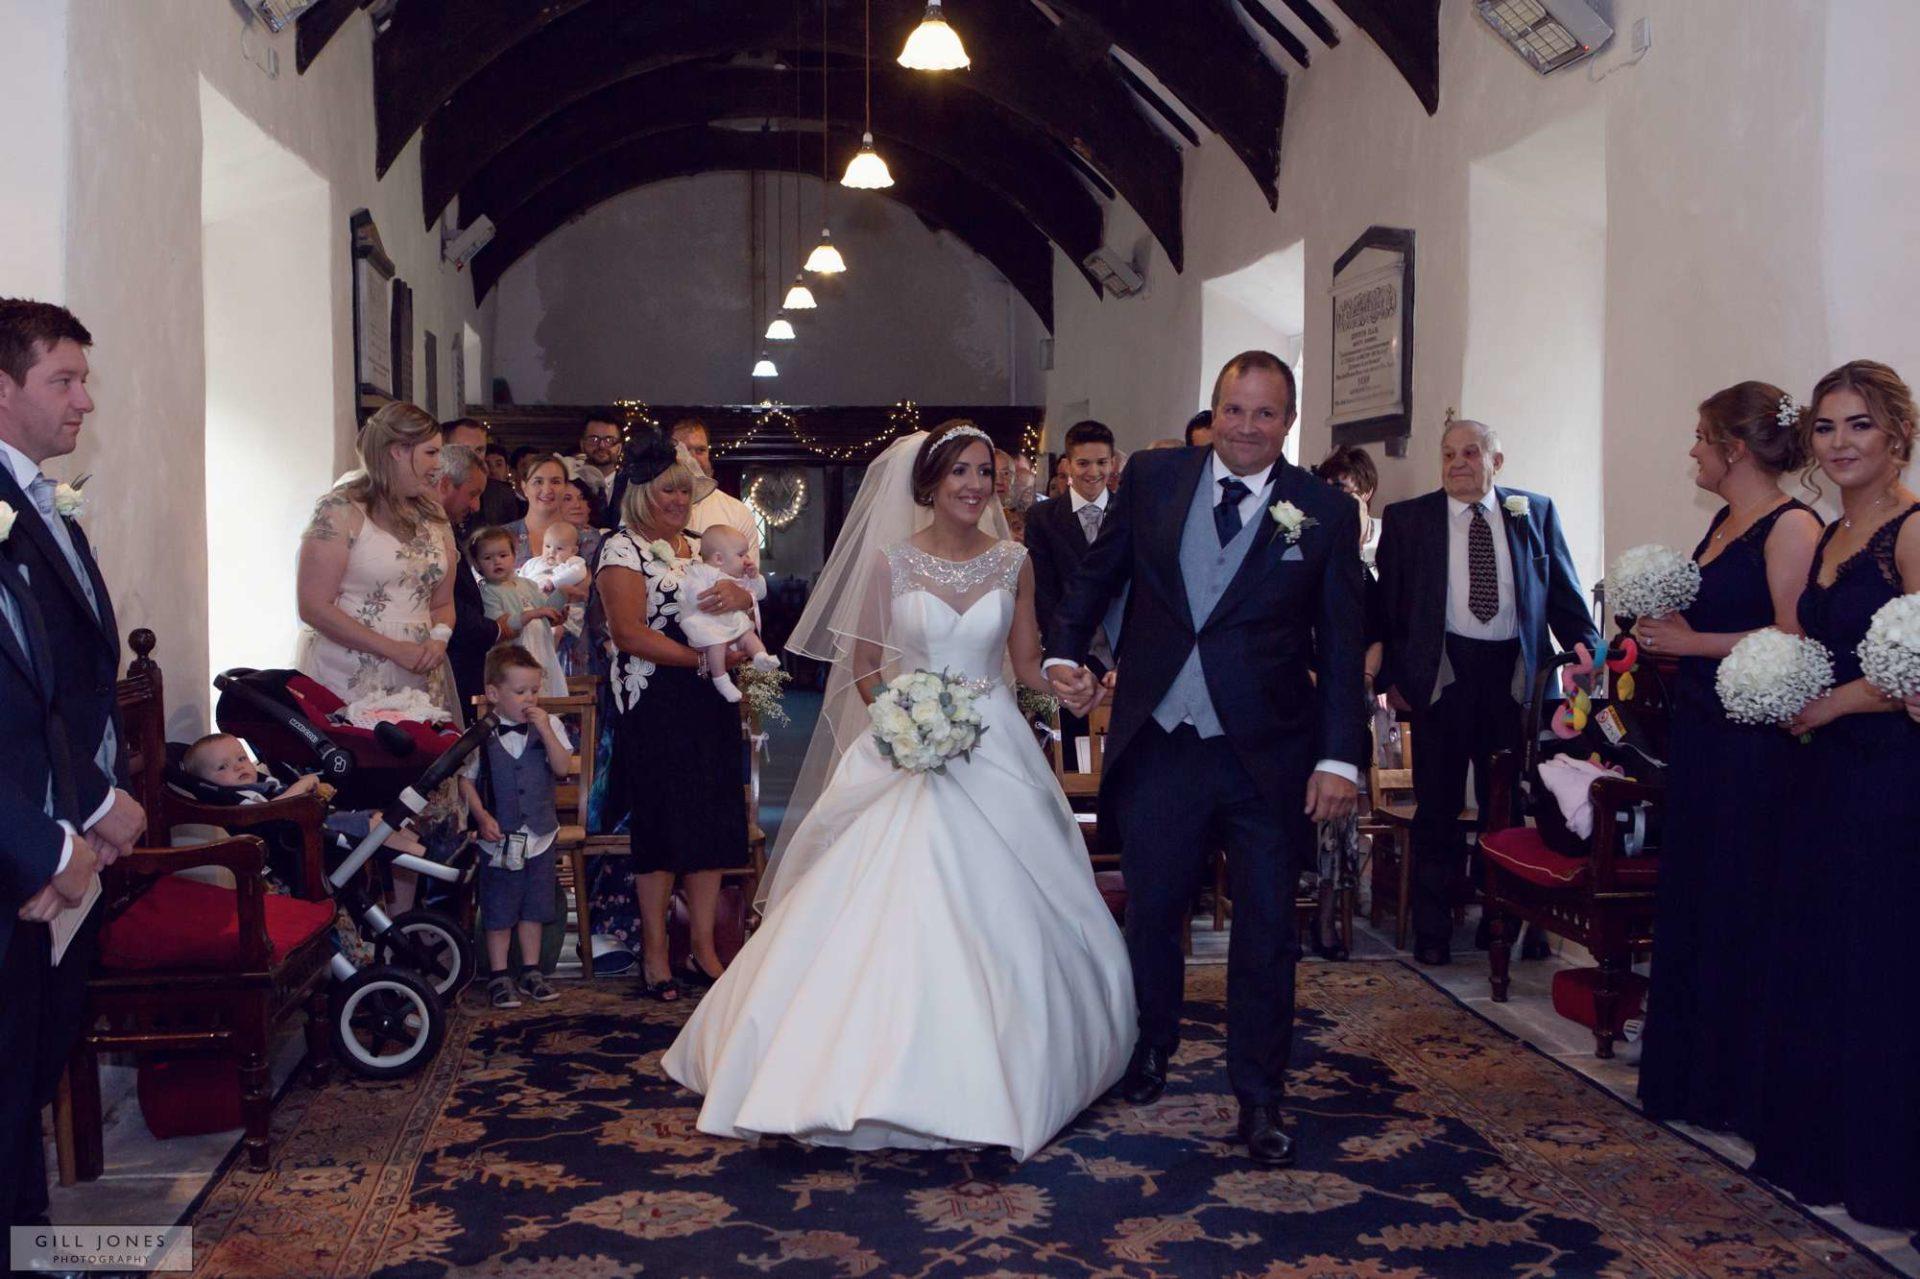 the bride walking towards the groom